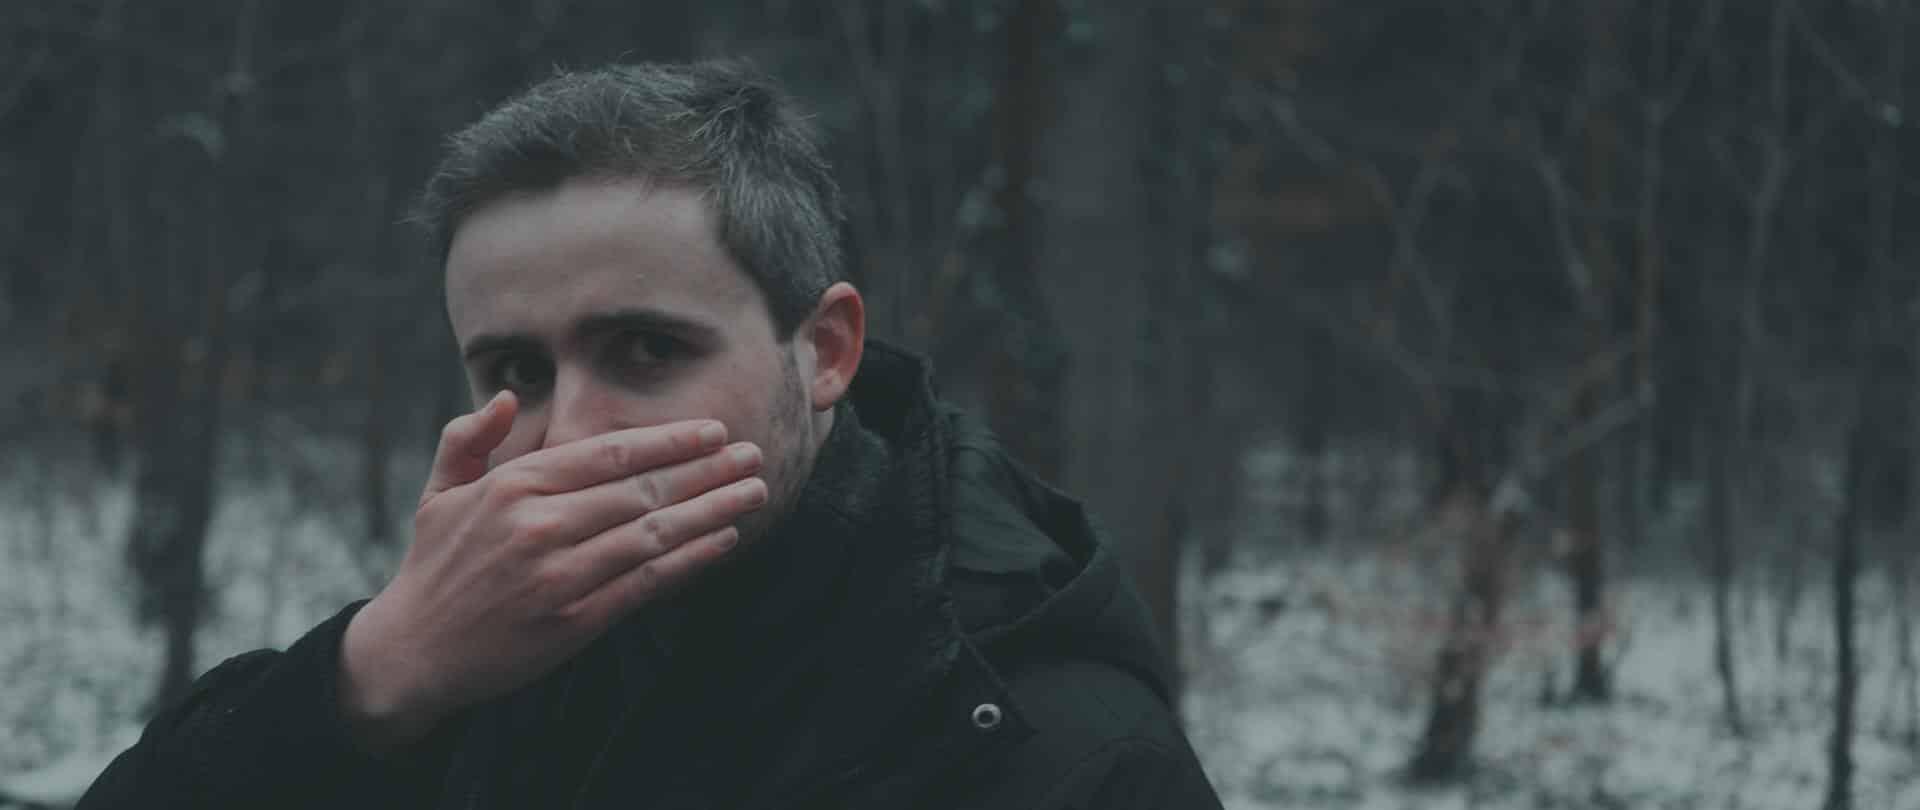 Blazin'Daniel - No Name (Musikvideo).00_04_11_18.Standbild264